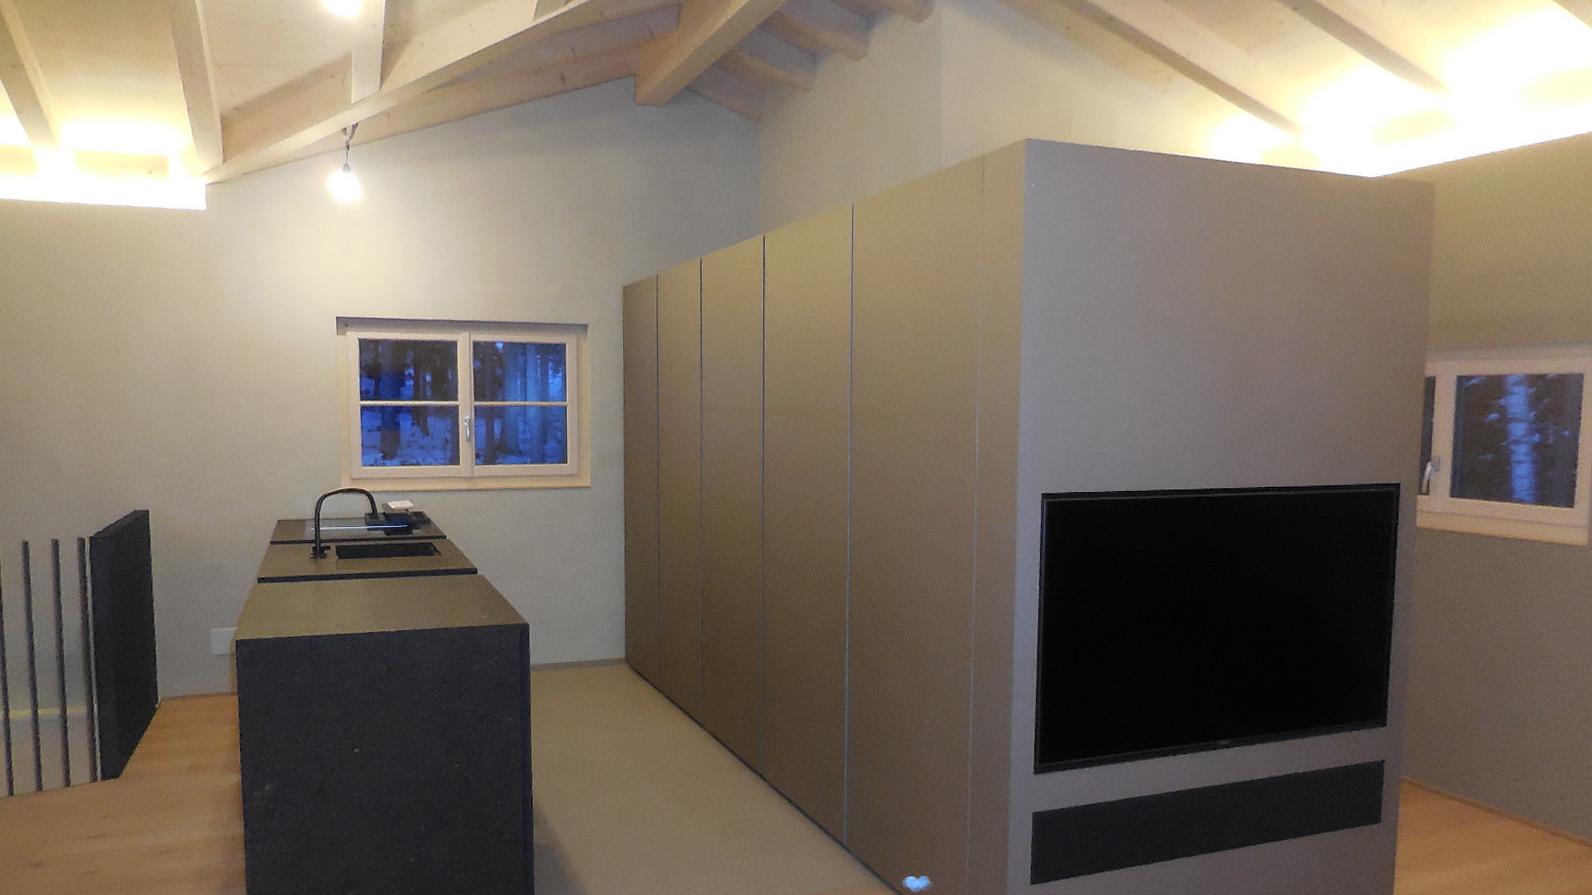 The Capricorn Apts Apartments, Switzerland